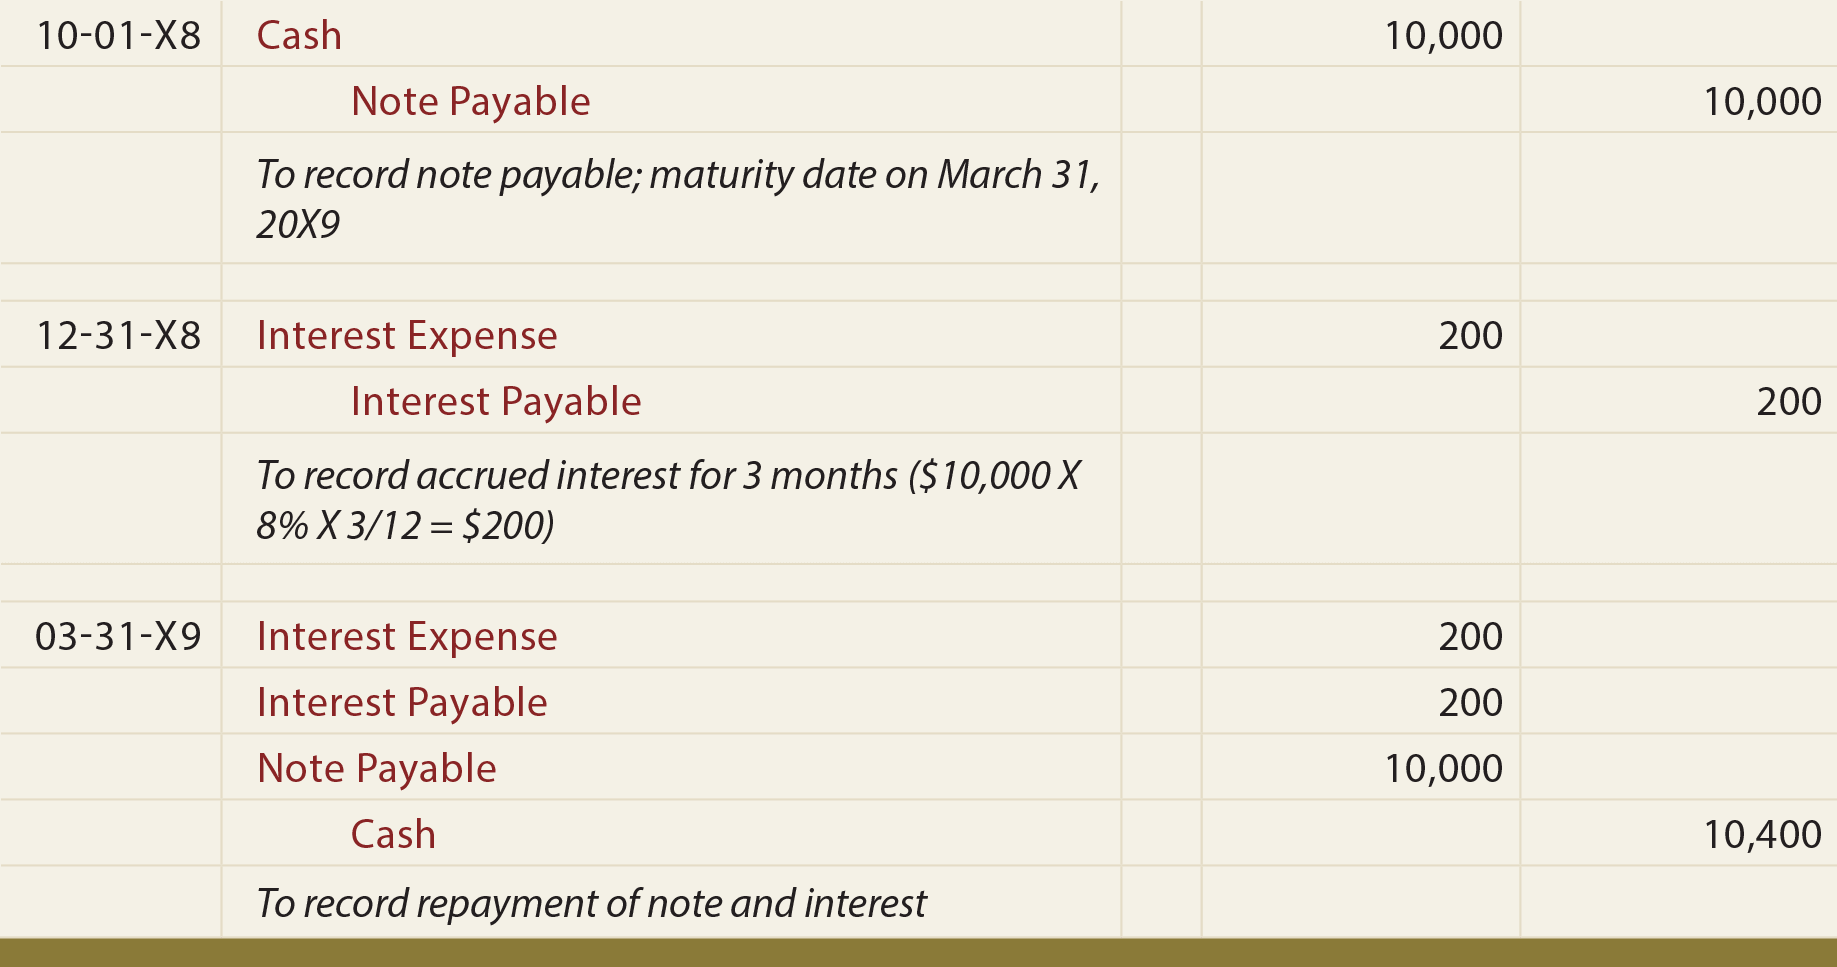 Good Notes Payable Principlesofaccountingcom Notepay3 Notes Payable In Note Payables